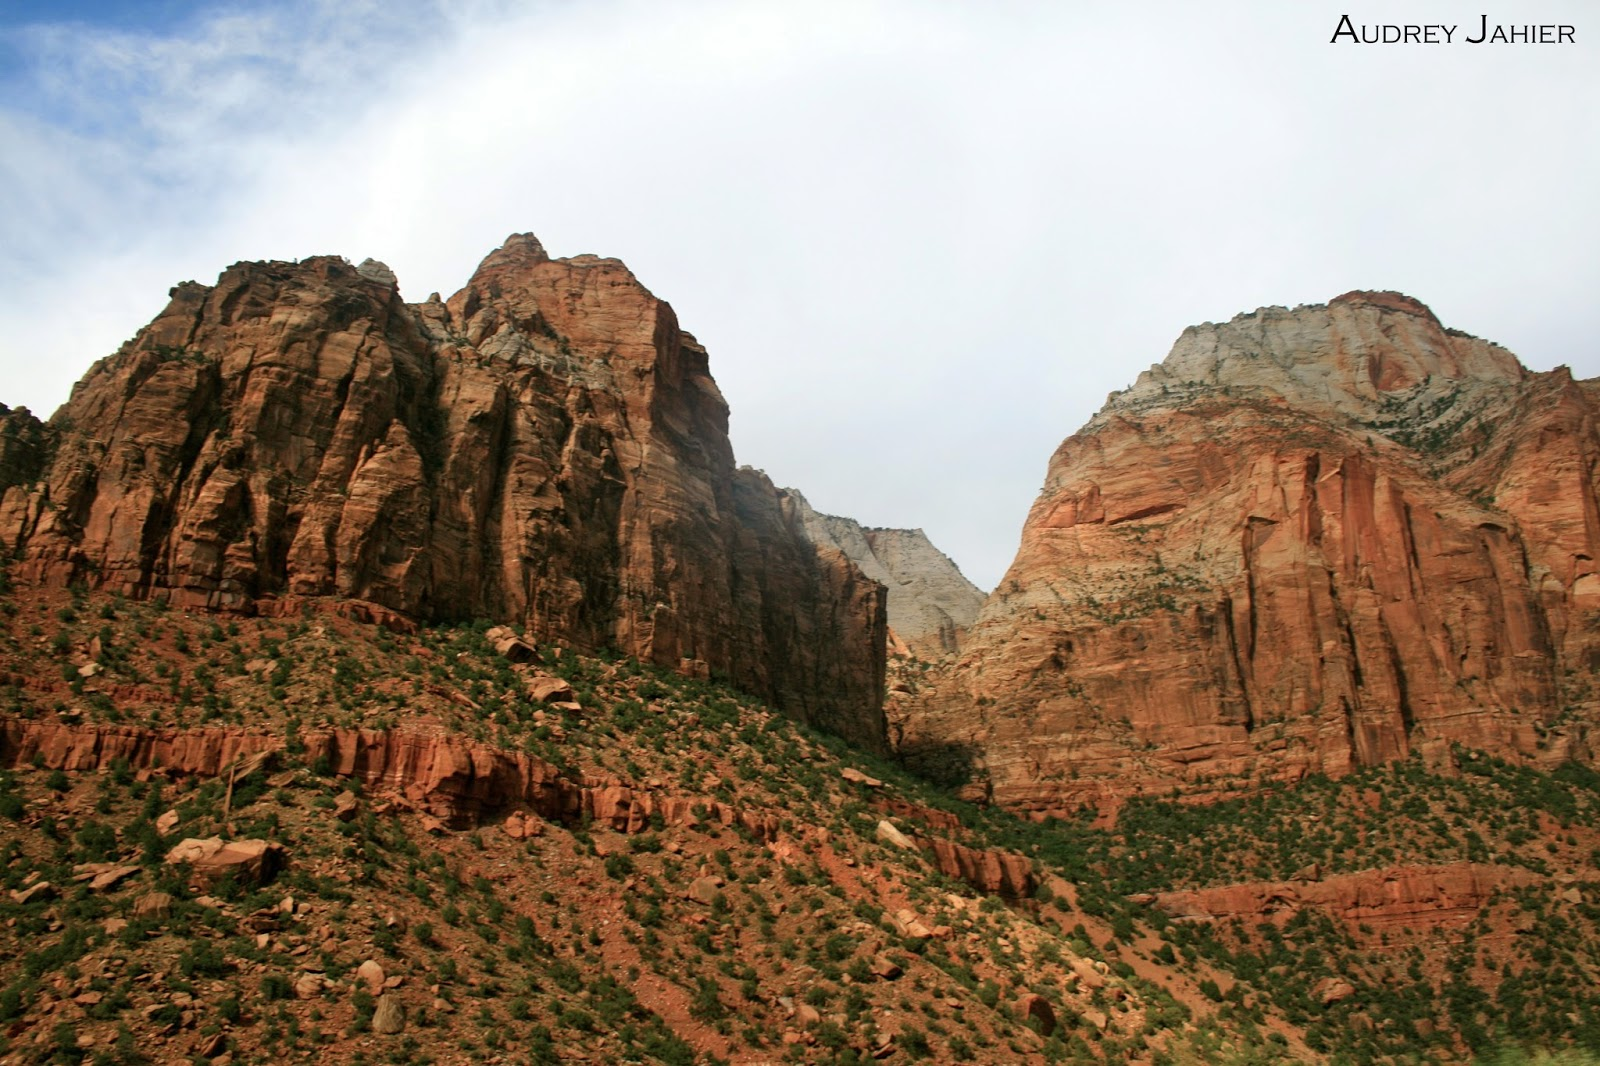 zion-national-park-road-trip-USA